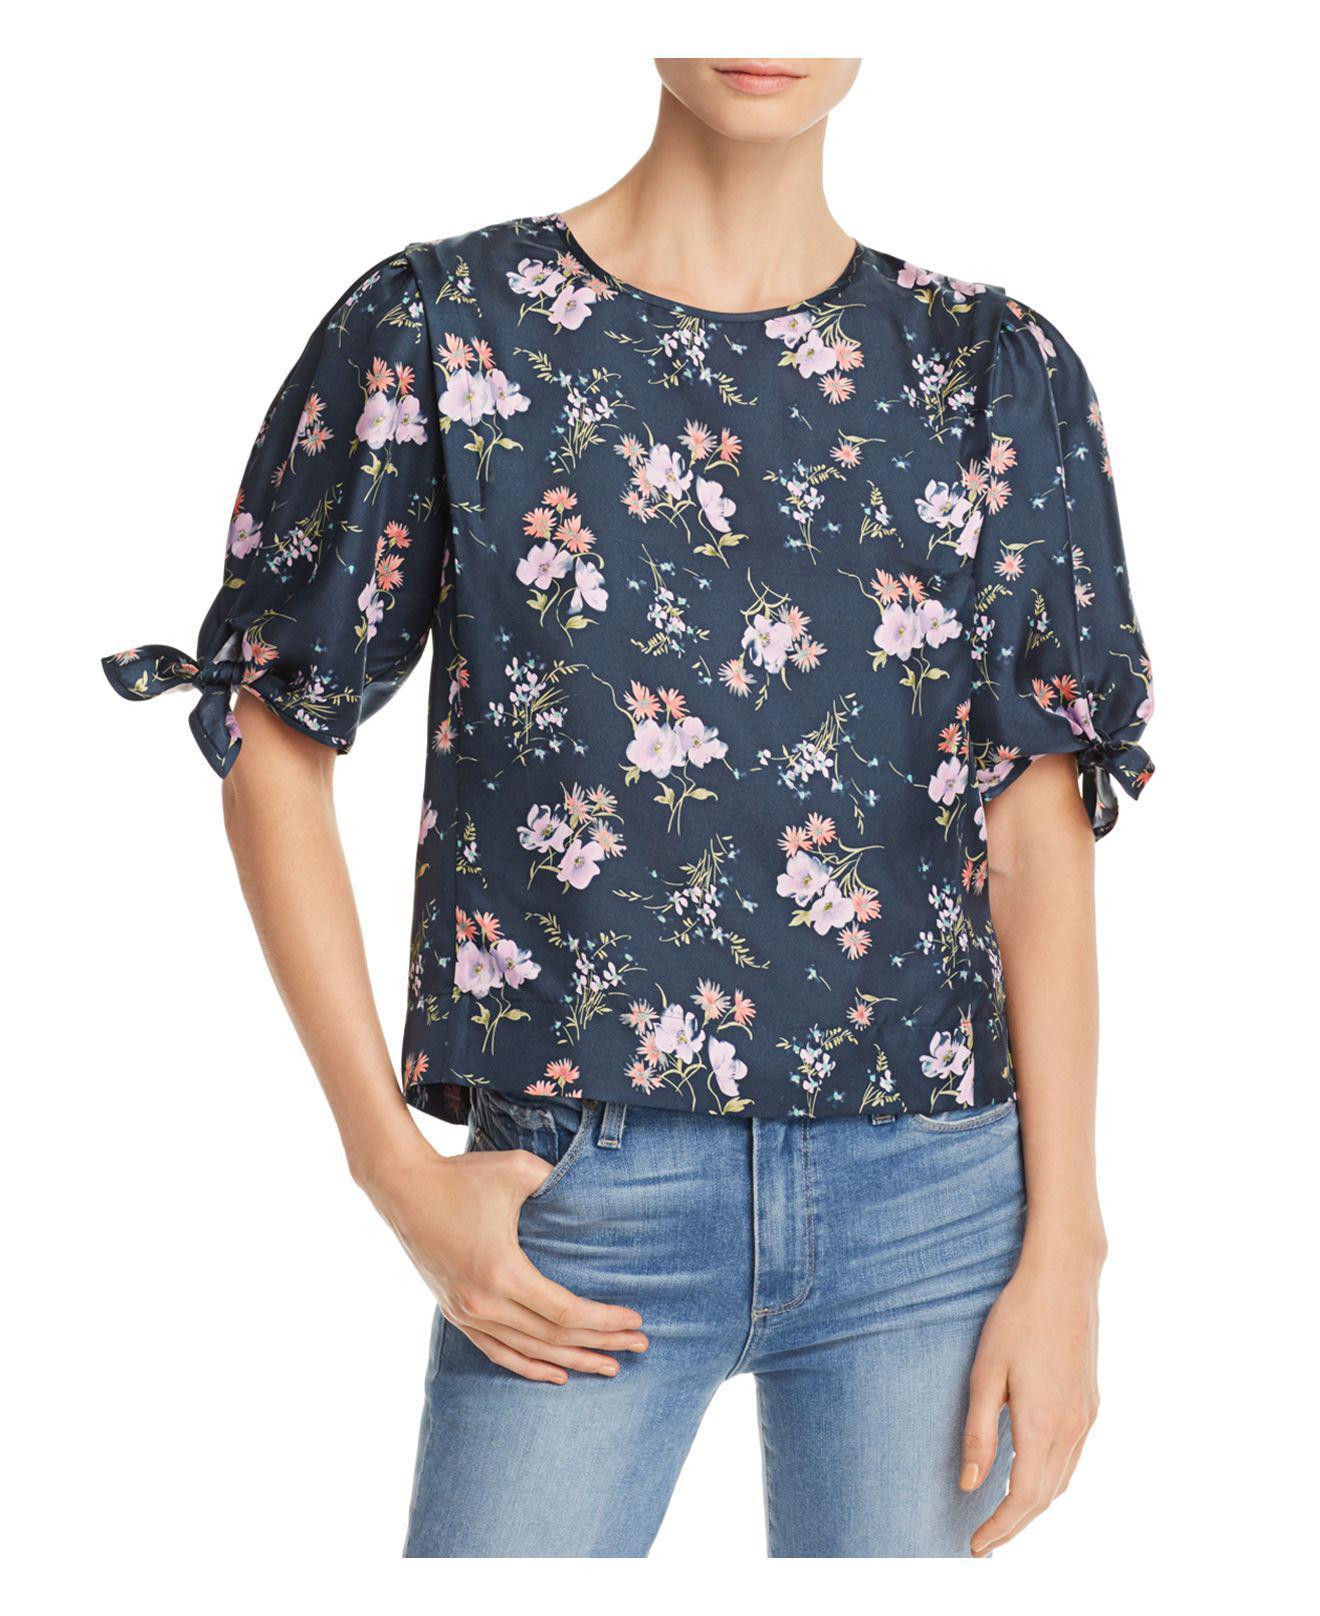 Cheap Price Wholesale Emilia floral-print silk-twill top Rebecca Taylor Amazing Price Sale Online Cheap Price Cost Big Sale Cheap Online QMgIONoJ